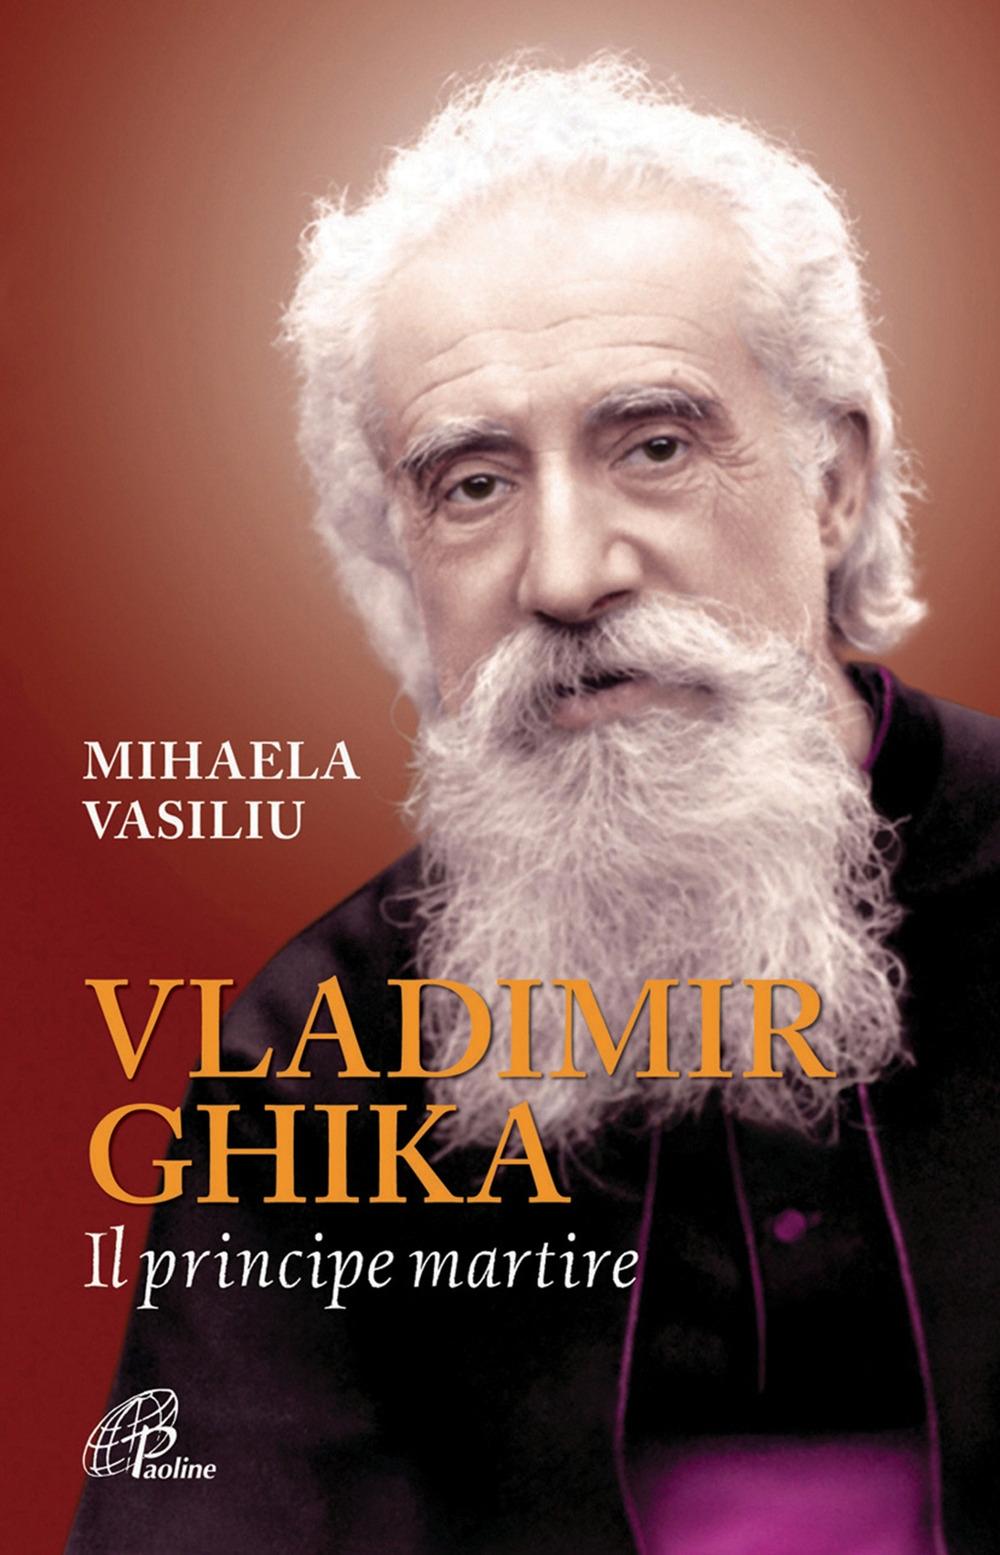 Vladimir Ghika. Il Principe Martire.